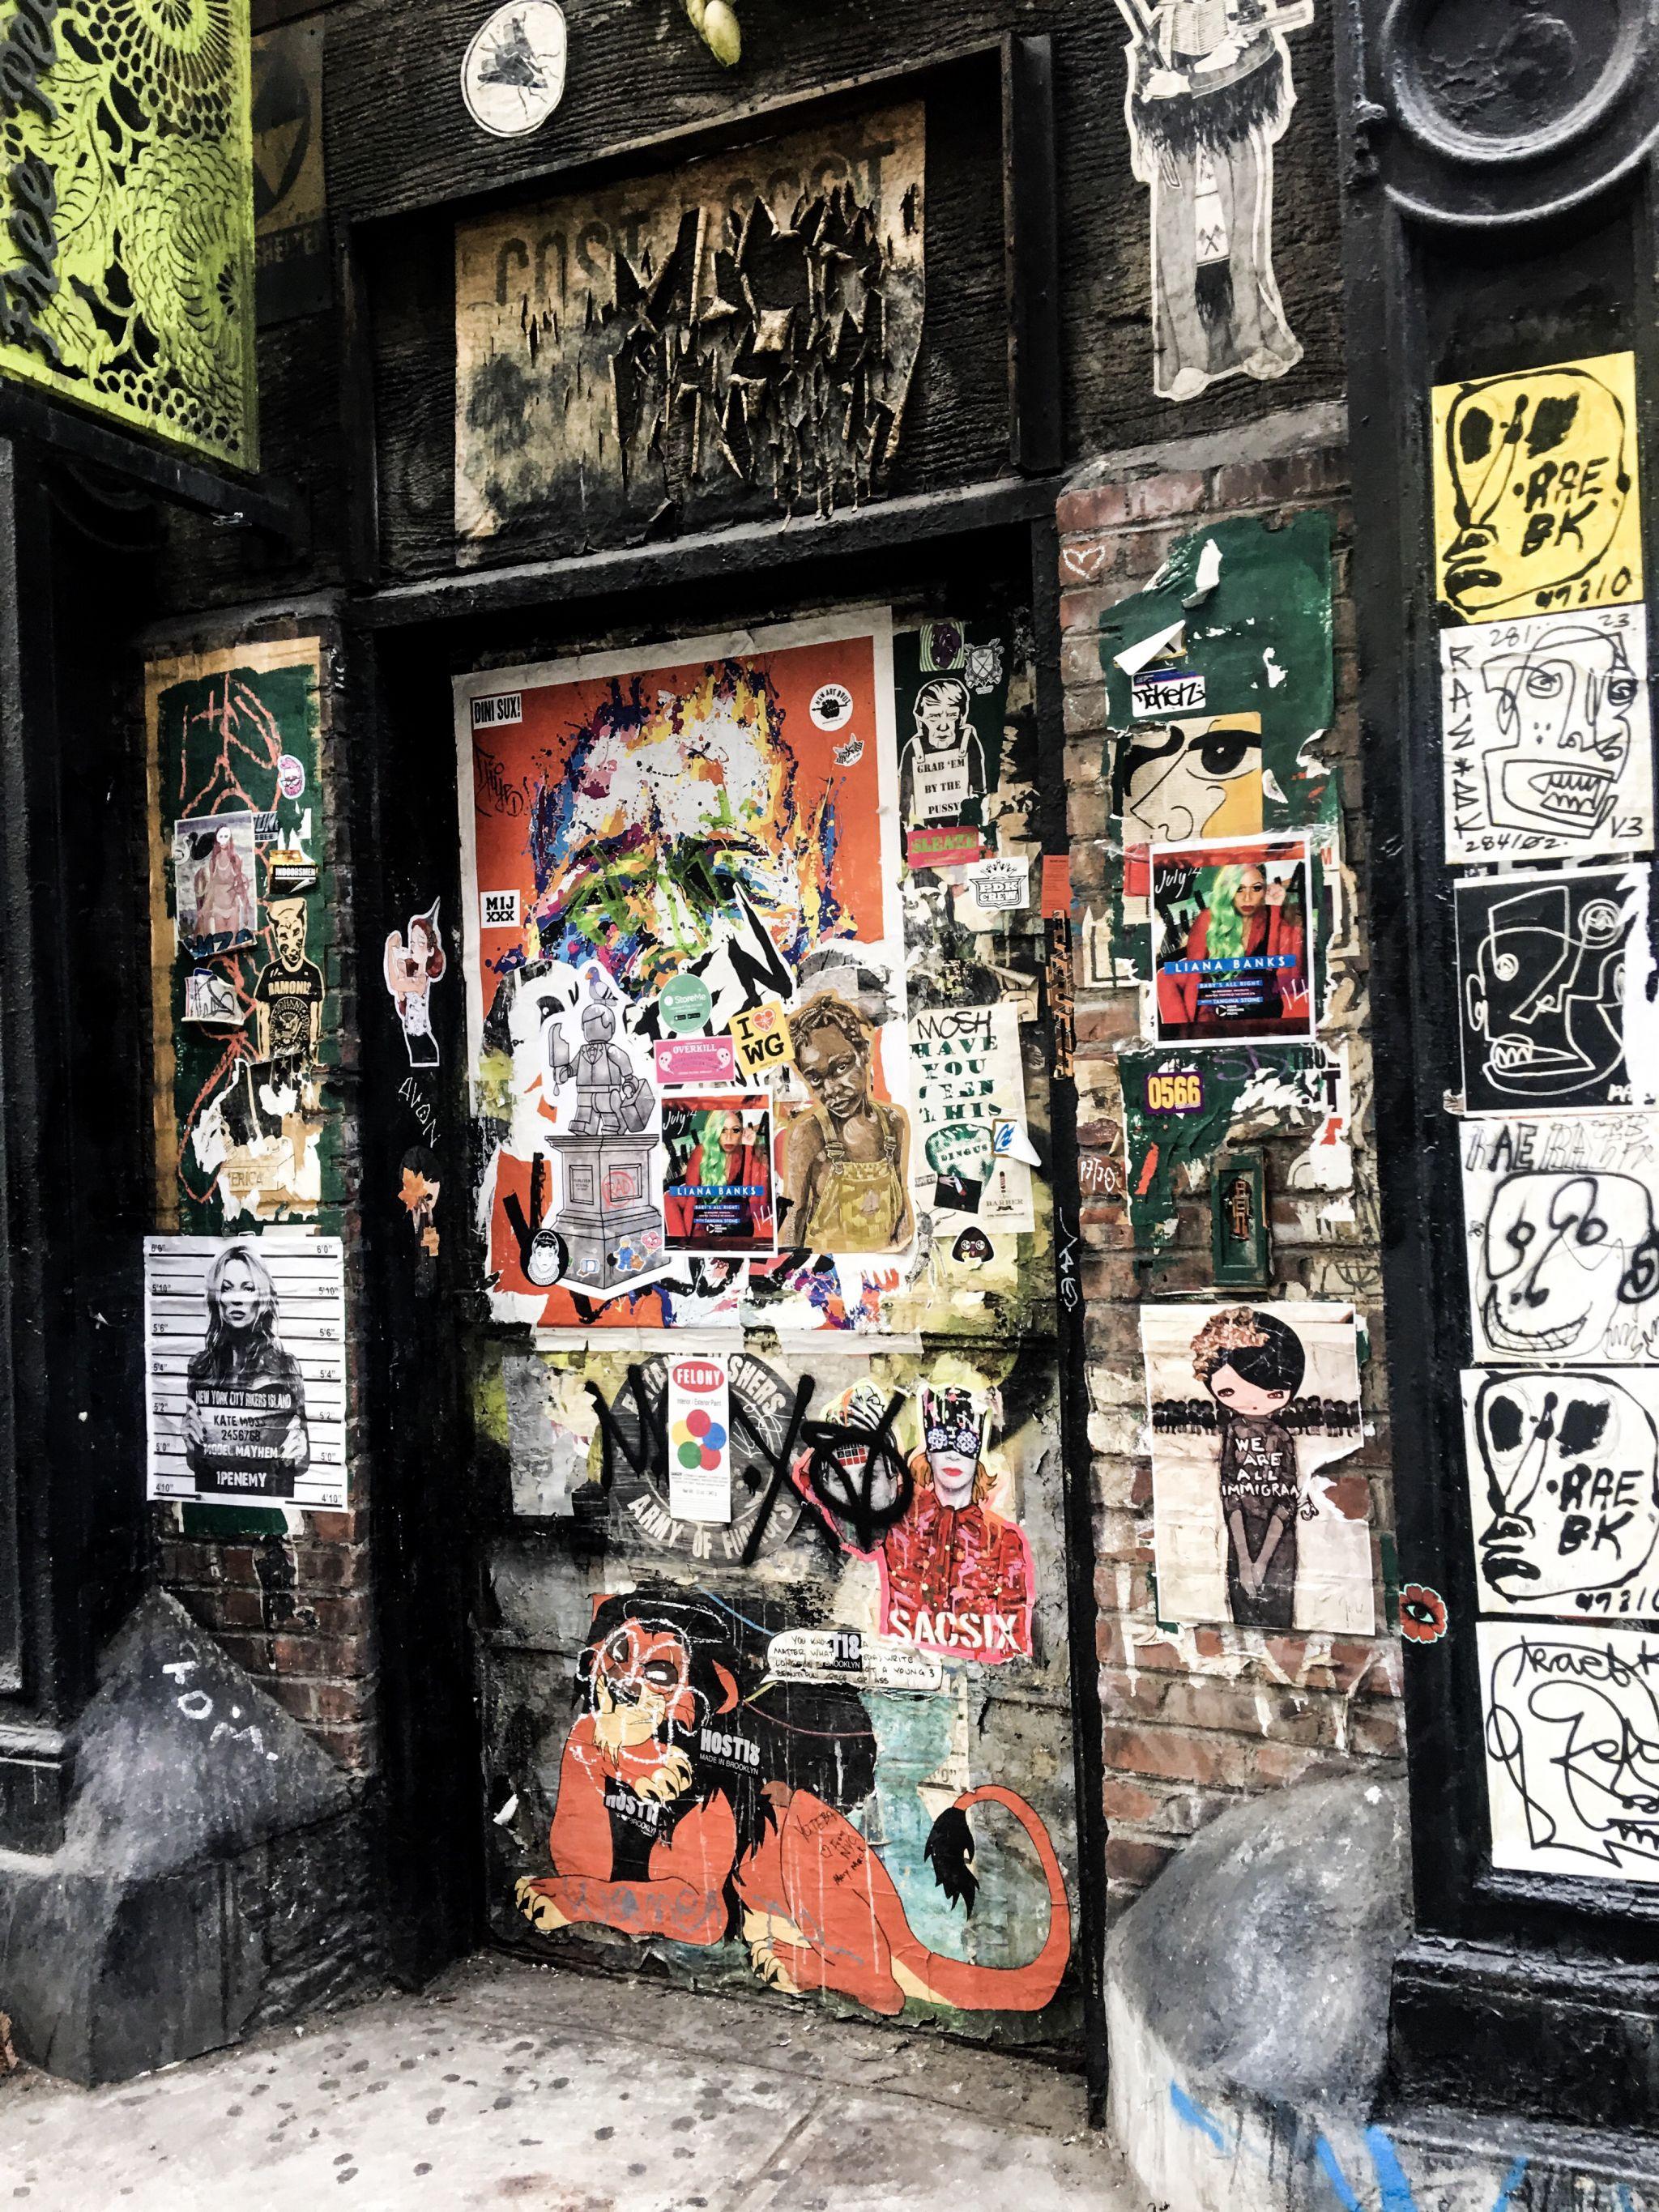 4 Tage in New York City - SoHo - Nowshine Reiseblog ü 40